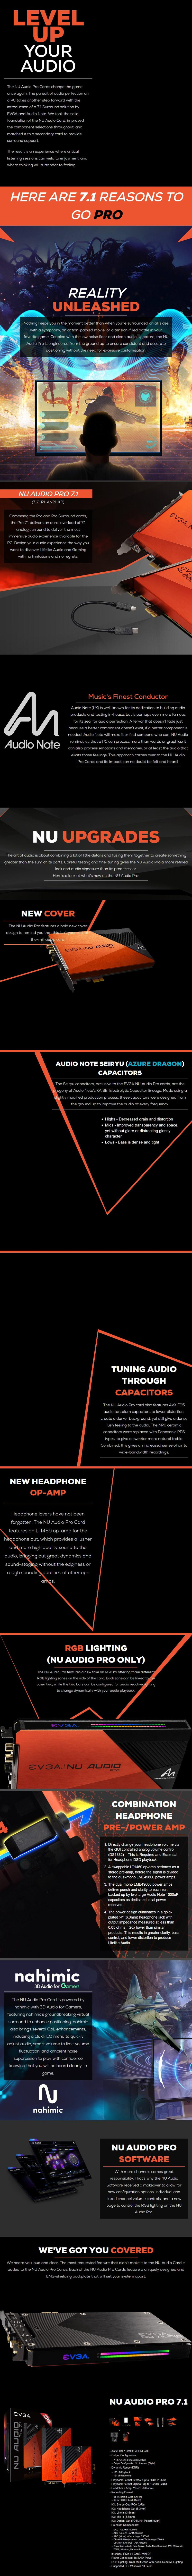 evga-nu-audio-pro-71-pcie-sound-card-ac36746-4.jpg